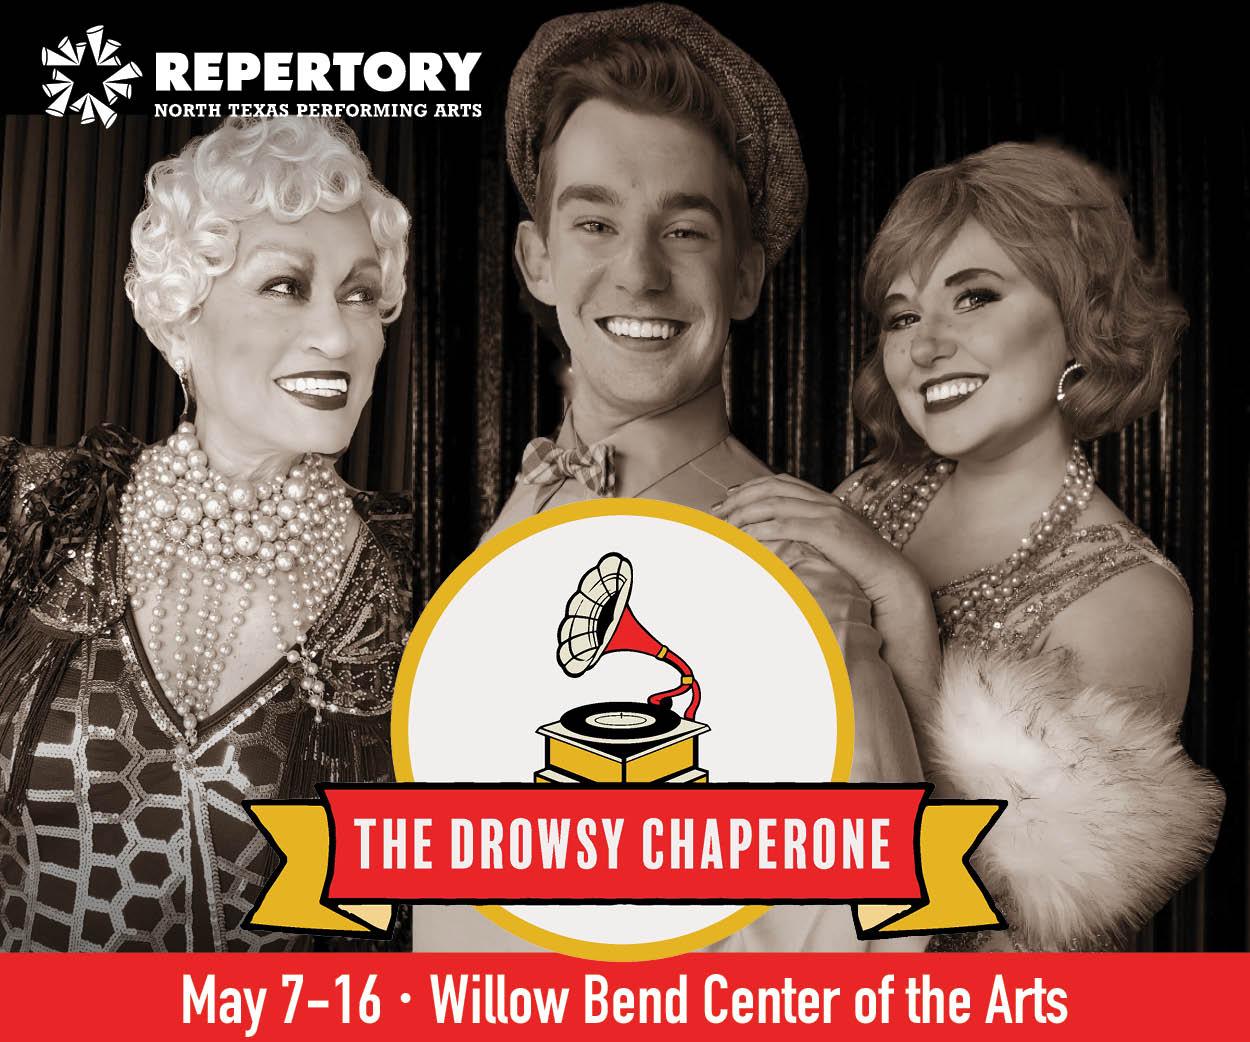 NTPA Repertory Drowsy Chaperone